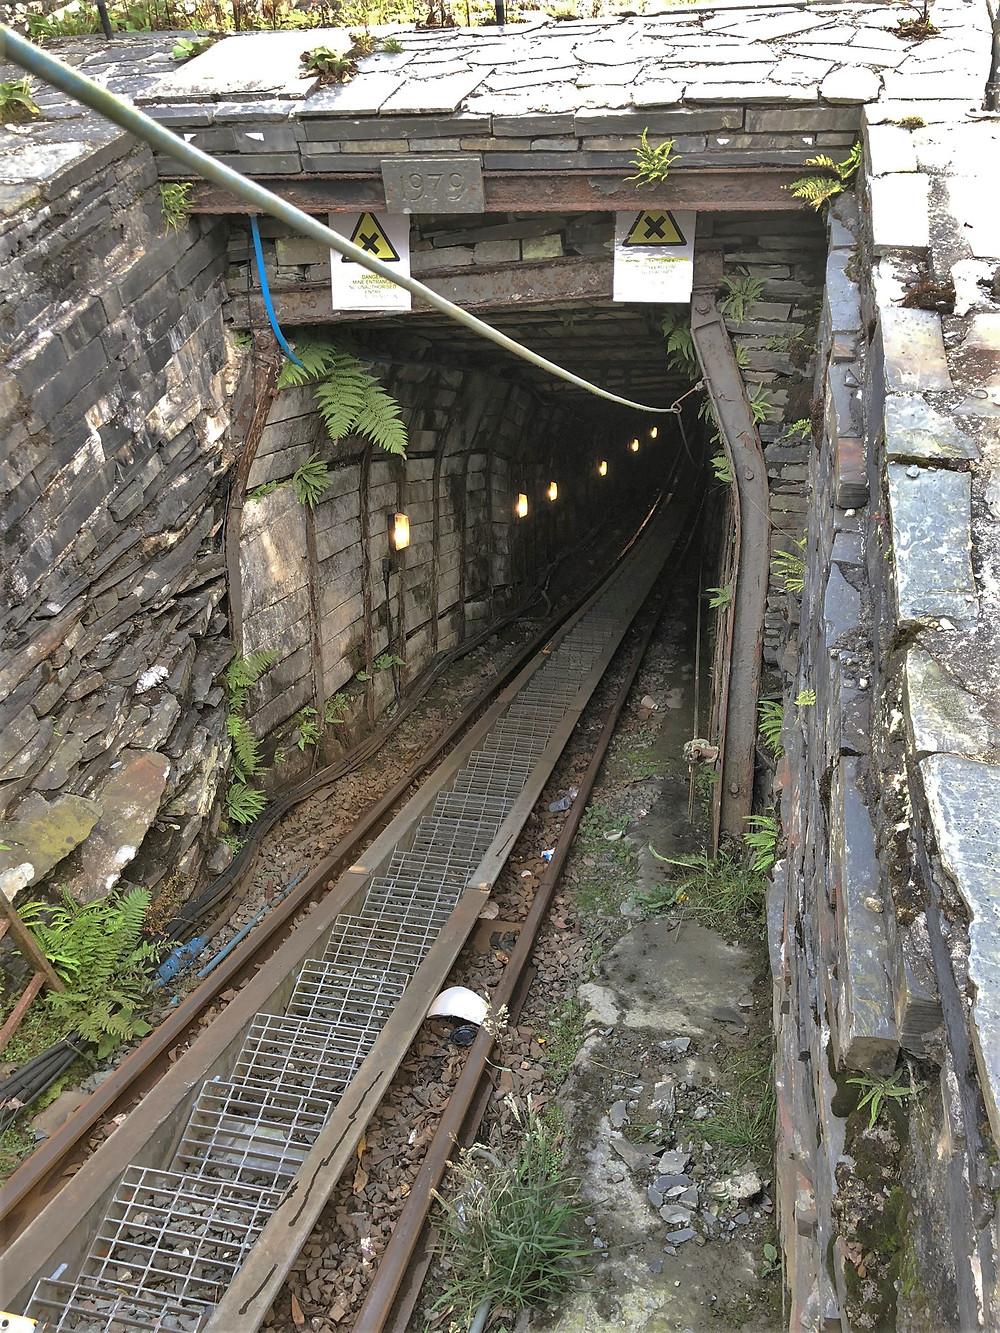 Steep cable railway car descends into Llechwedd Slate Quarry 500 feet below ground